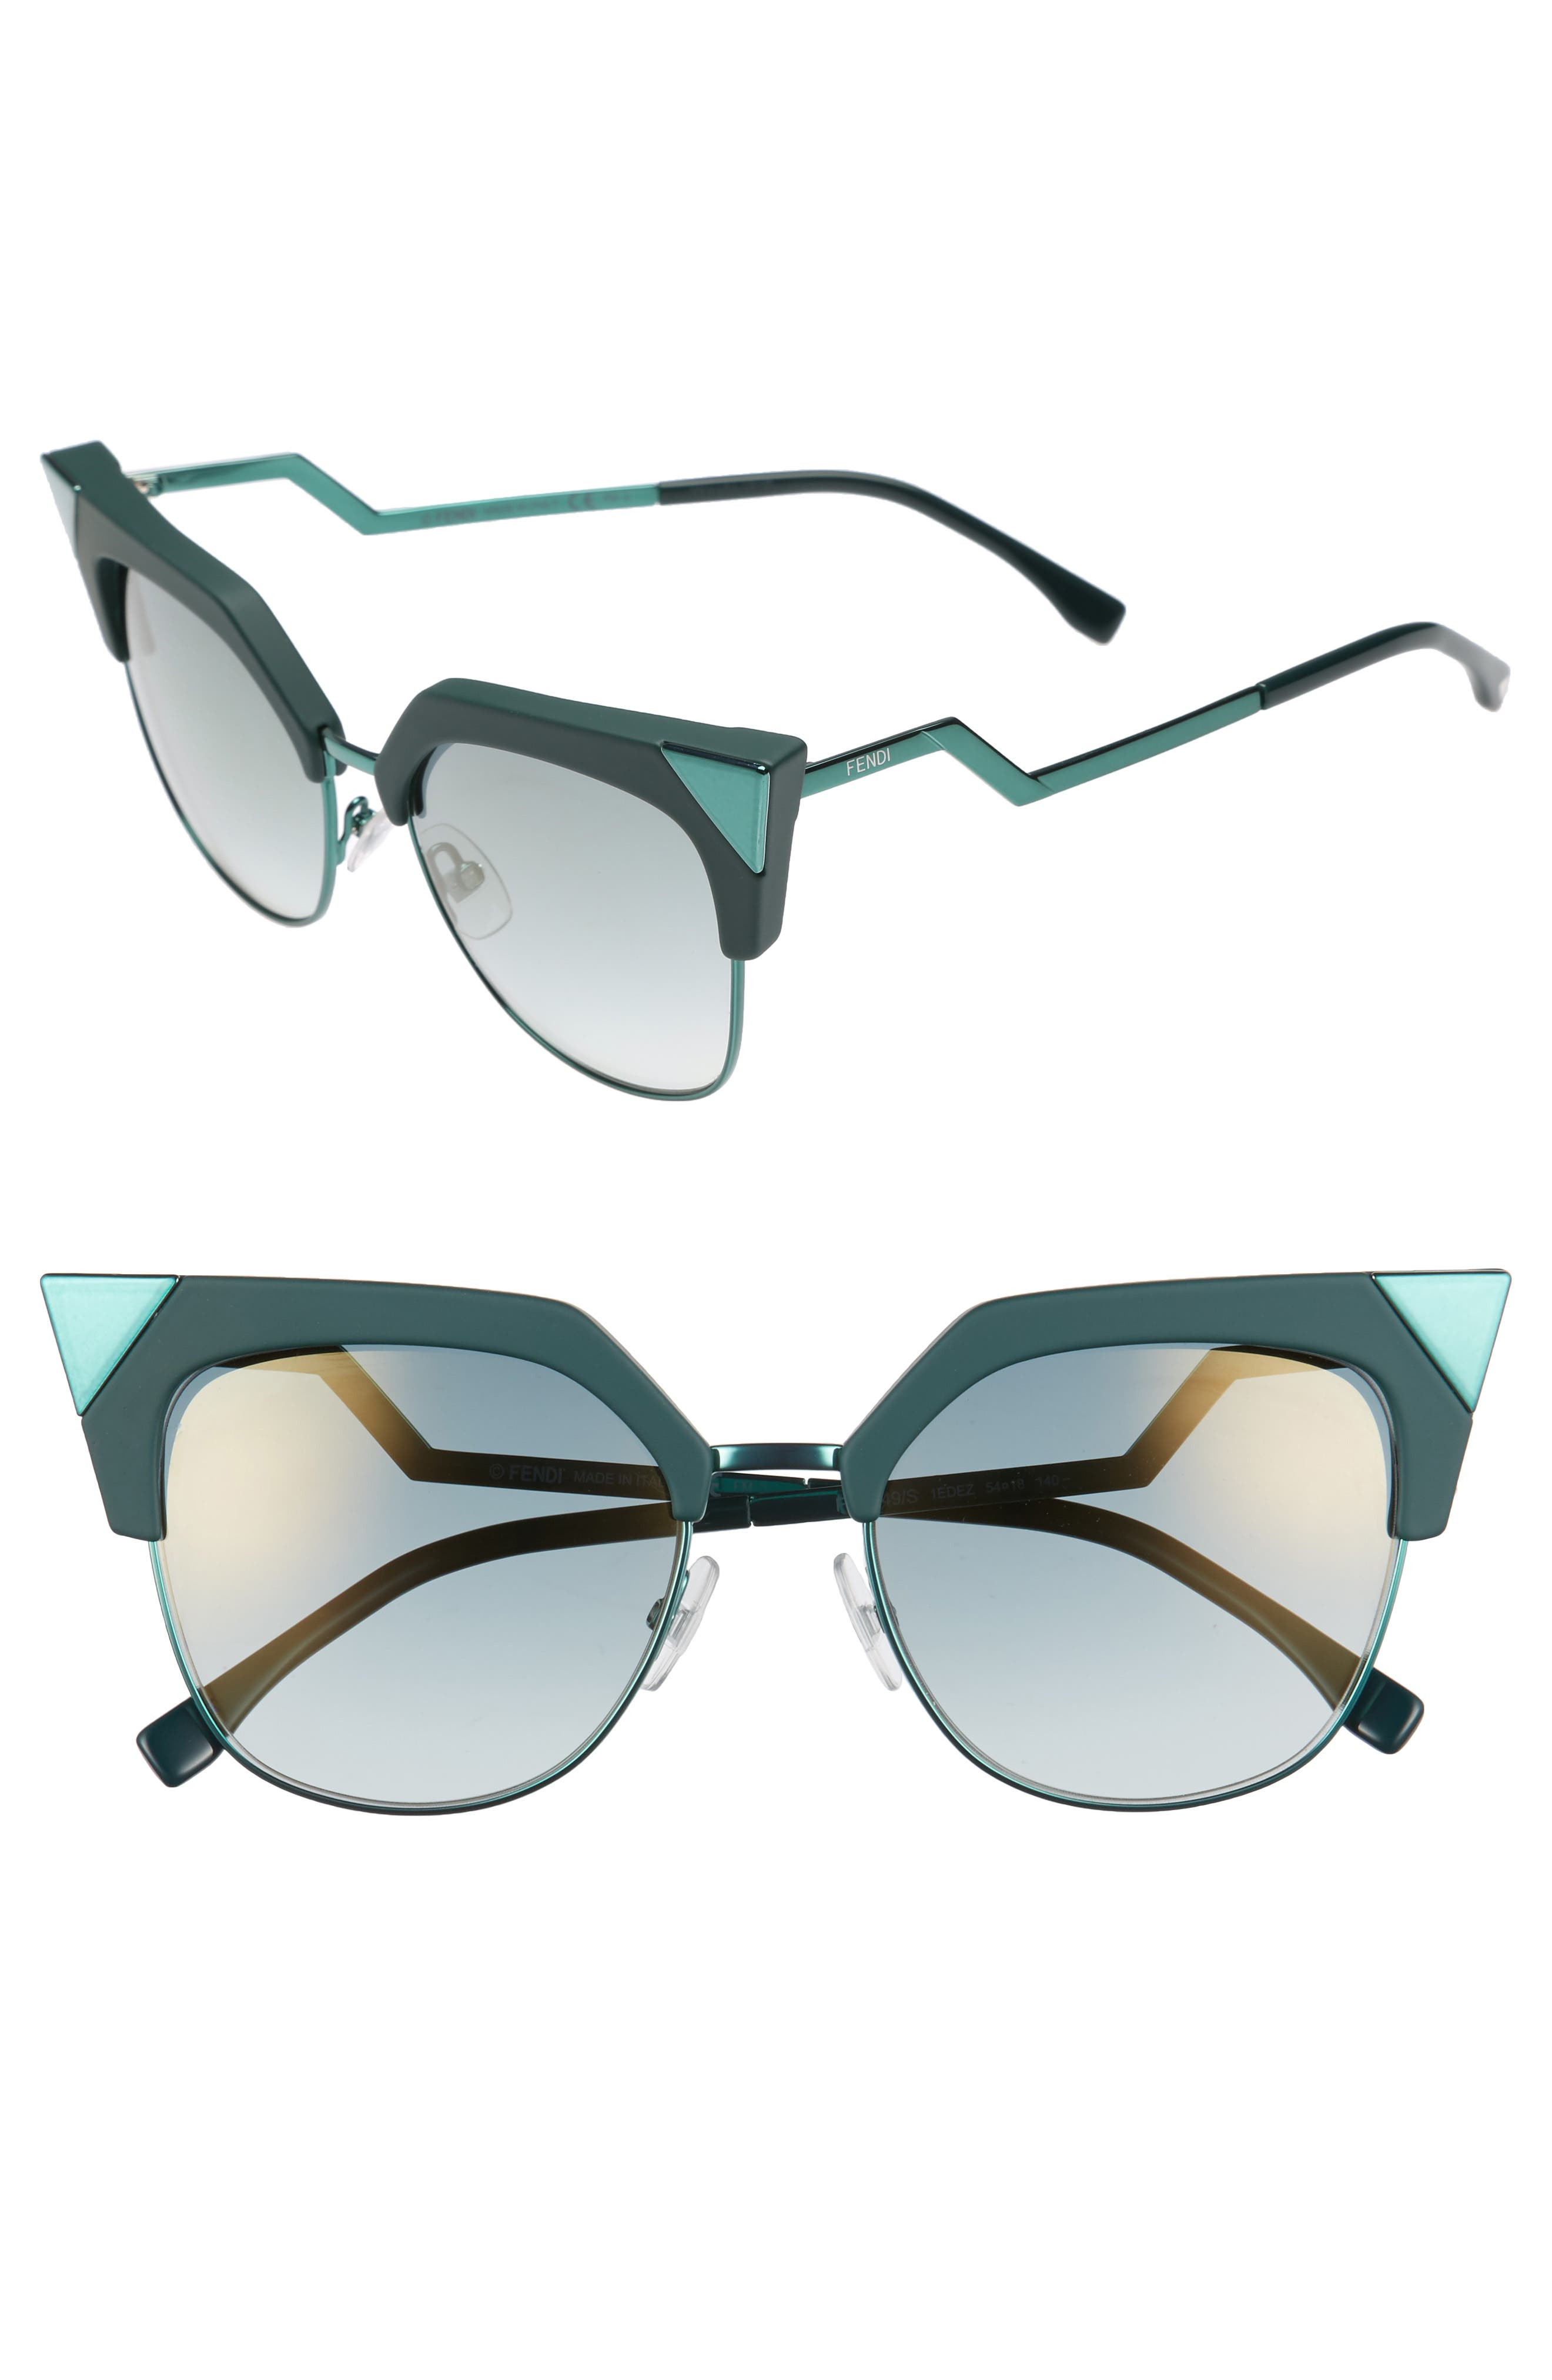 54mm Metal Tipped Cat Eye Sunglasses,                             Main thumbnail 1, color,                             GREEN